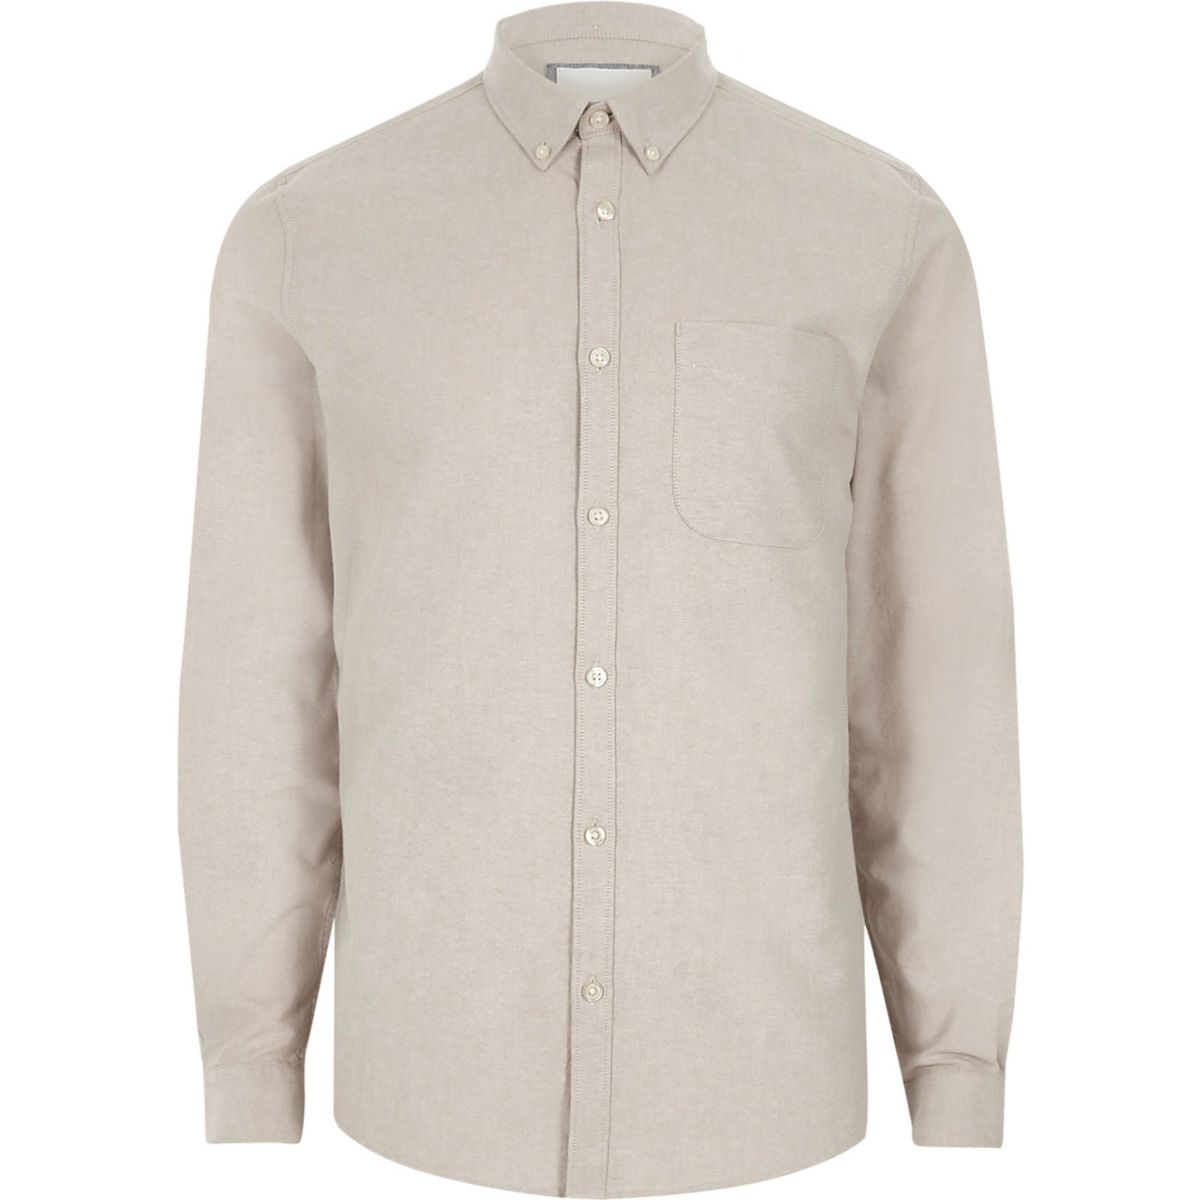 Stone button-down casual Oxford shirt